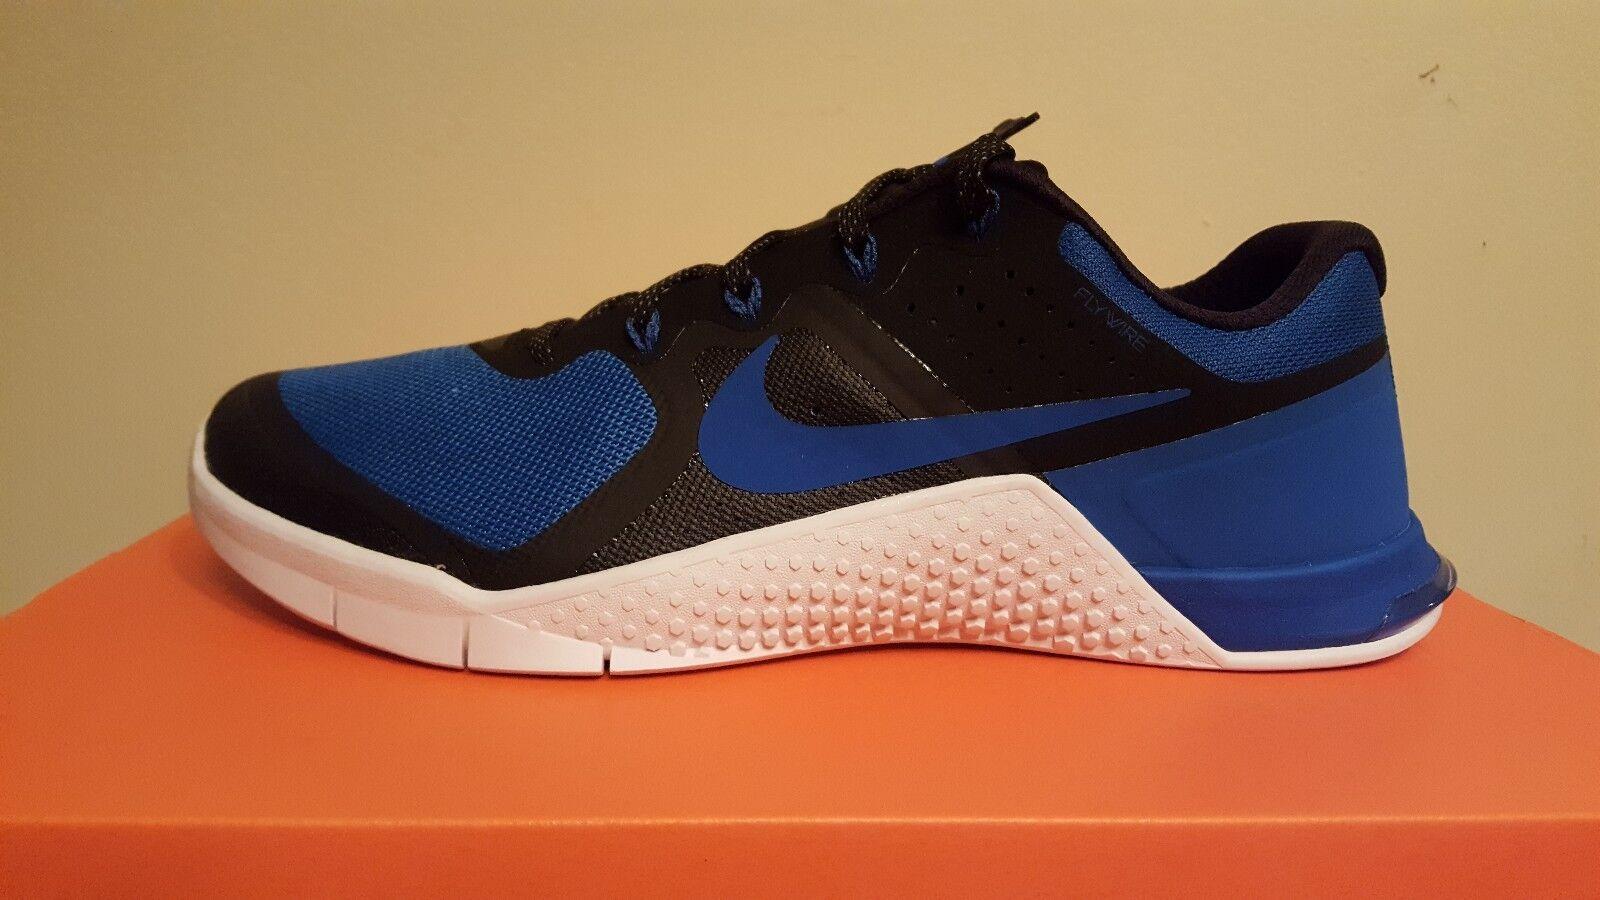 Nike Metcon 2 AMP-X Men's Training shoes shoes shoes (844634 033) e5e466